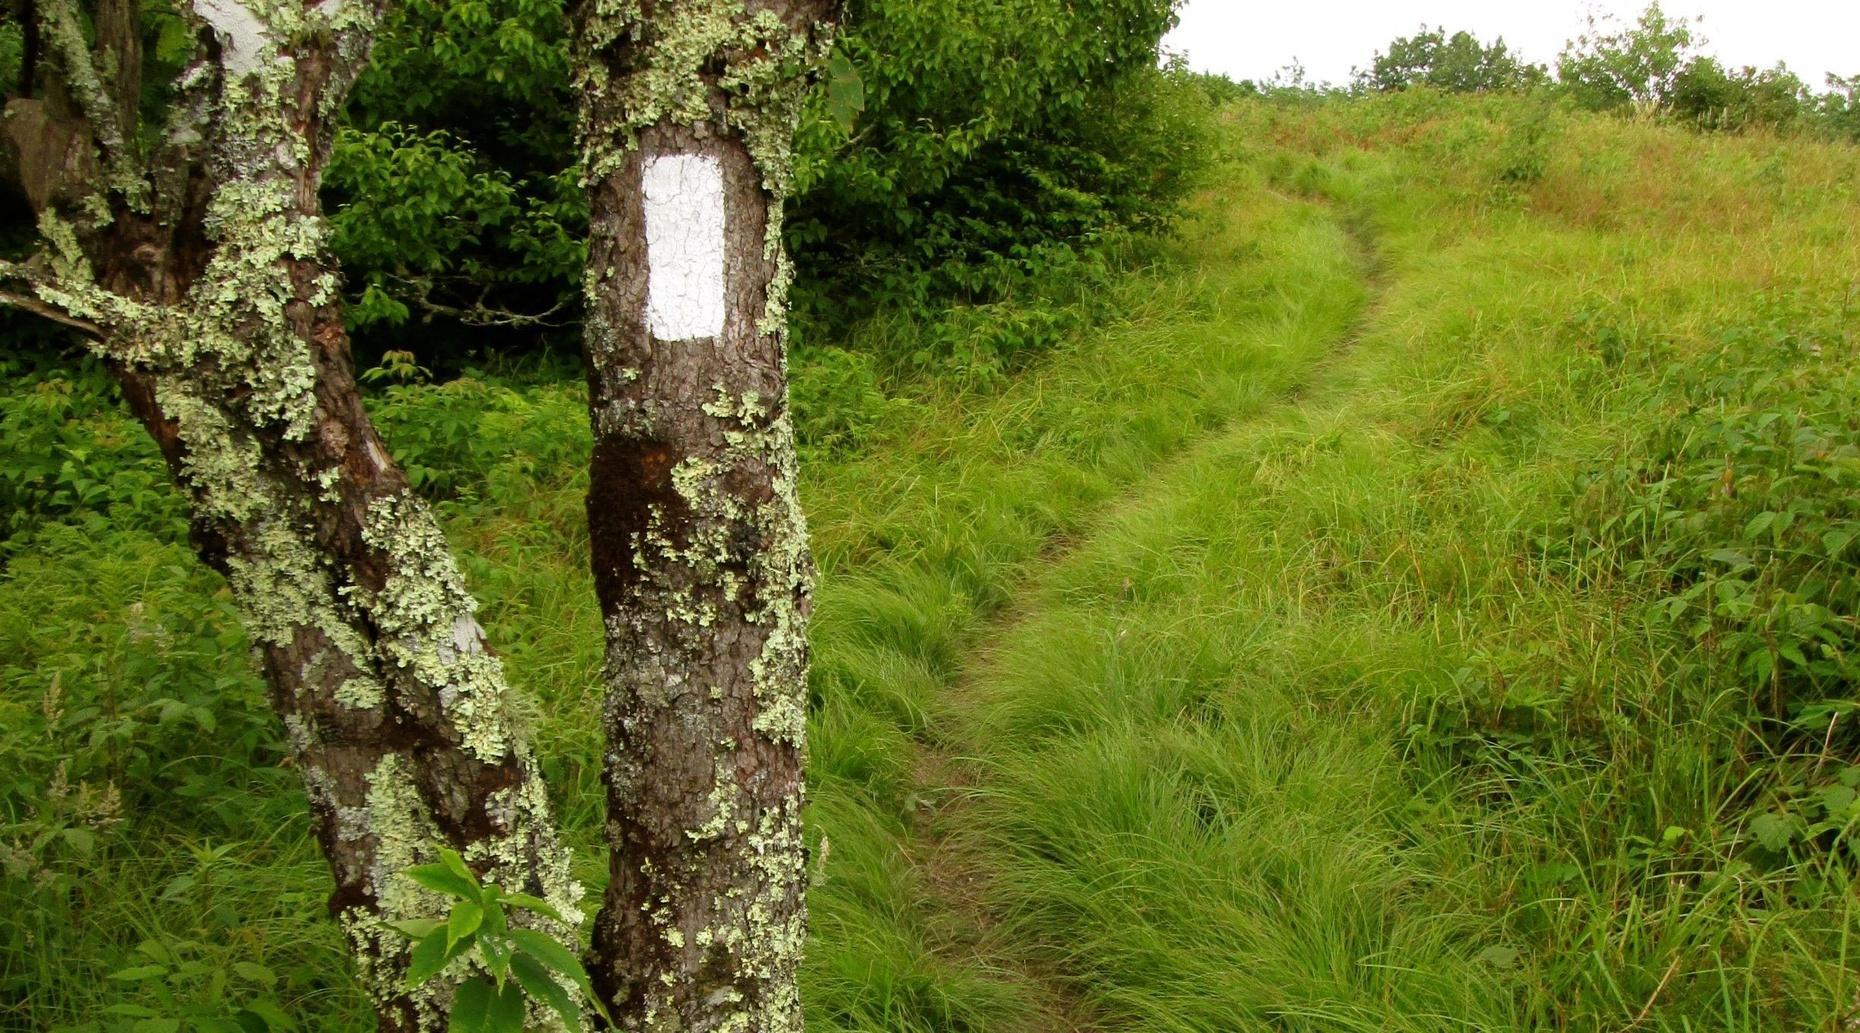 Appalachian Trail Day Hike